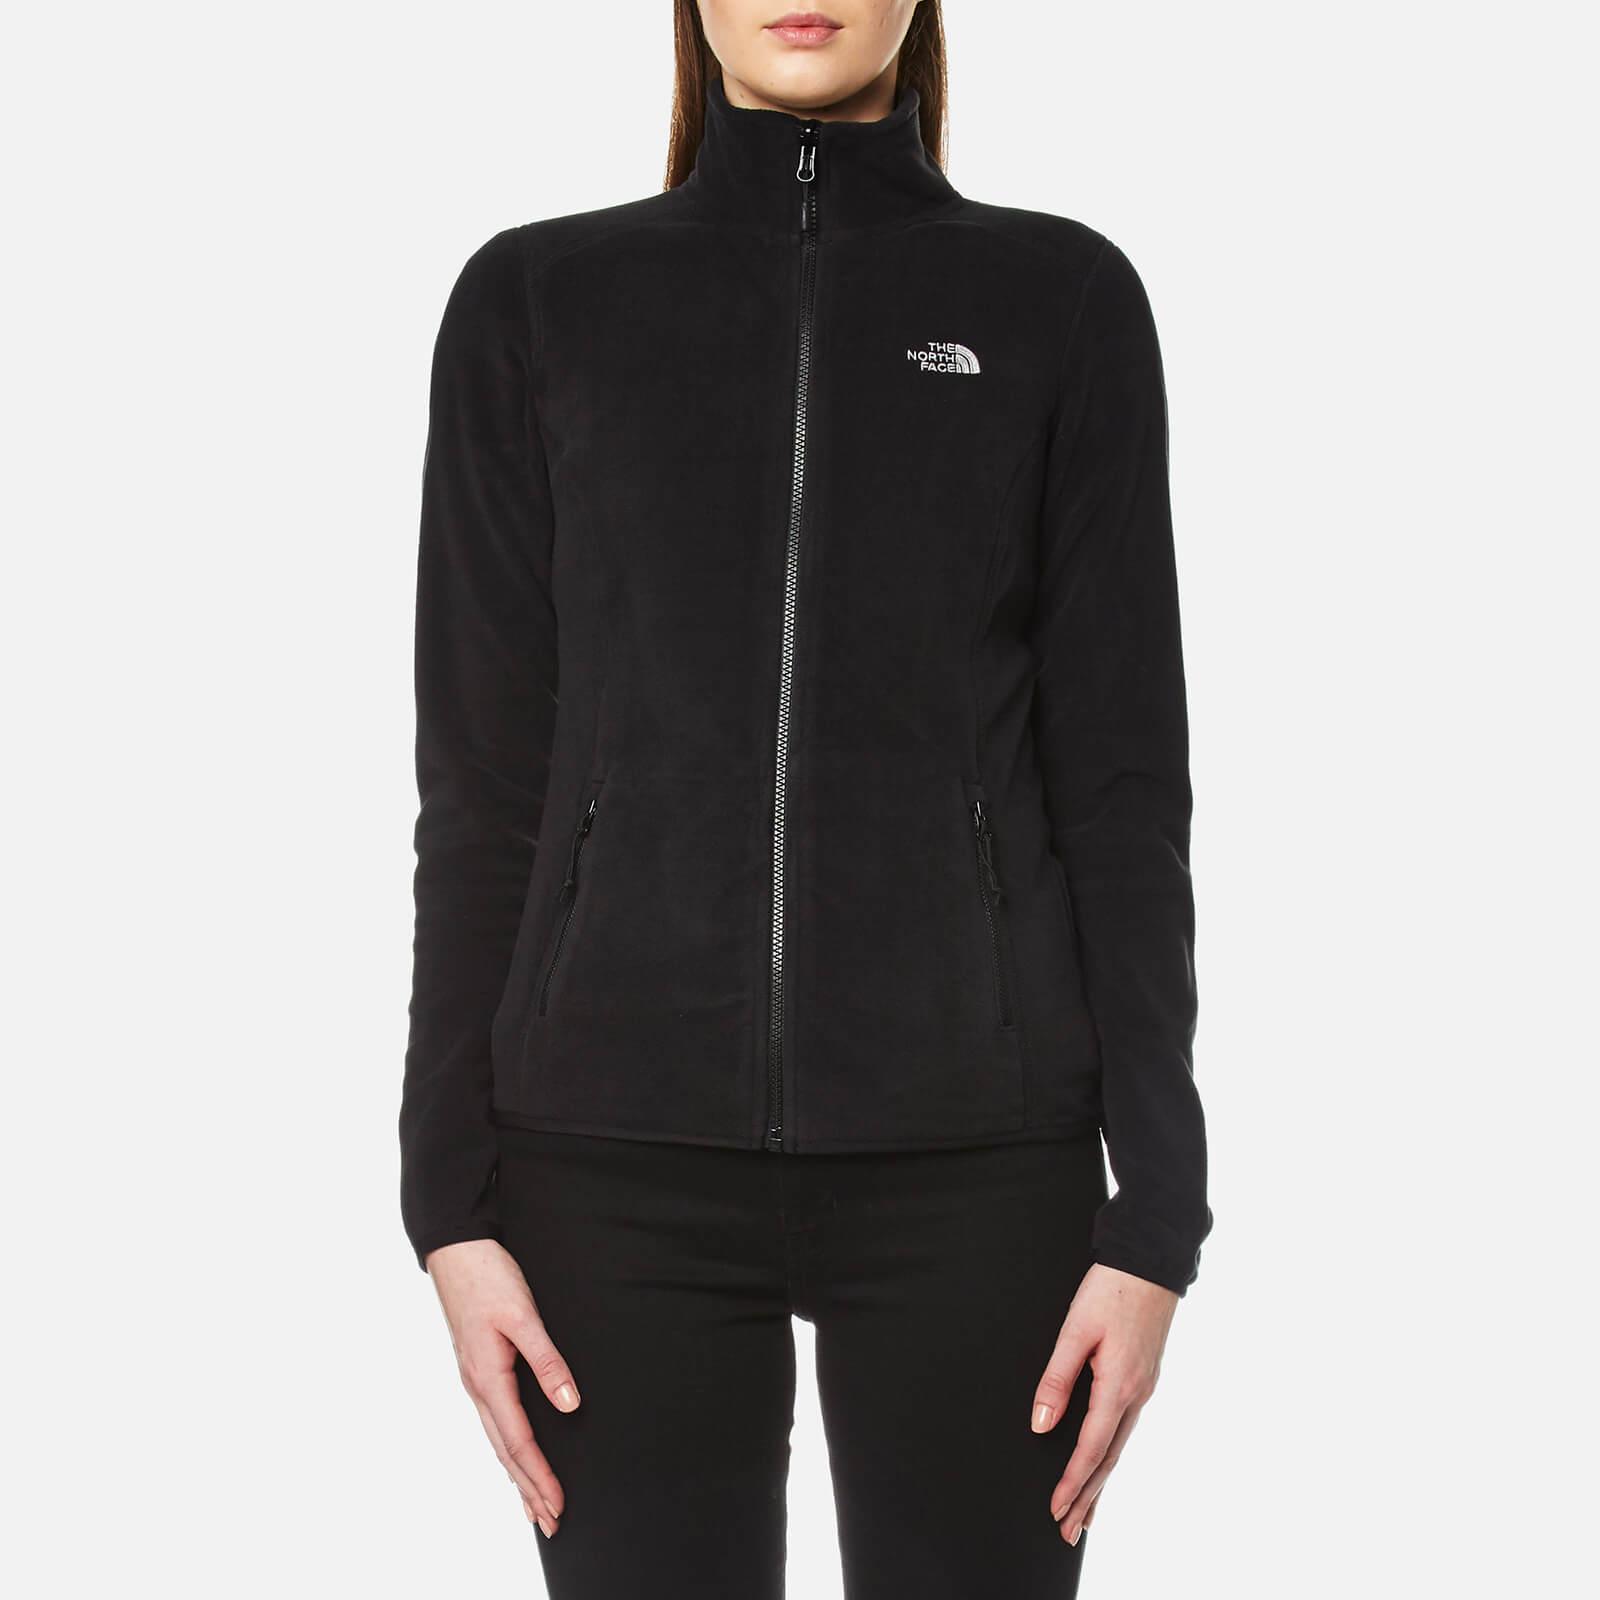 84d7fee5527 The North Face Women's 100 Glacier Full Zip Fleece - TNF Black Mens Clothing  | TheHut.com